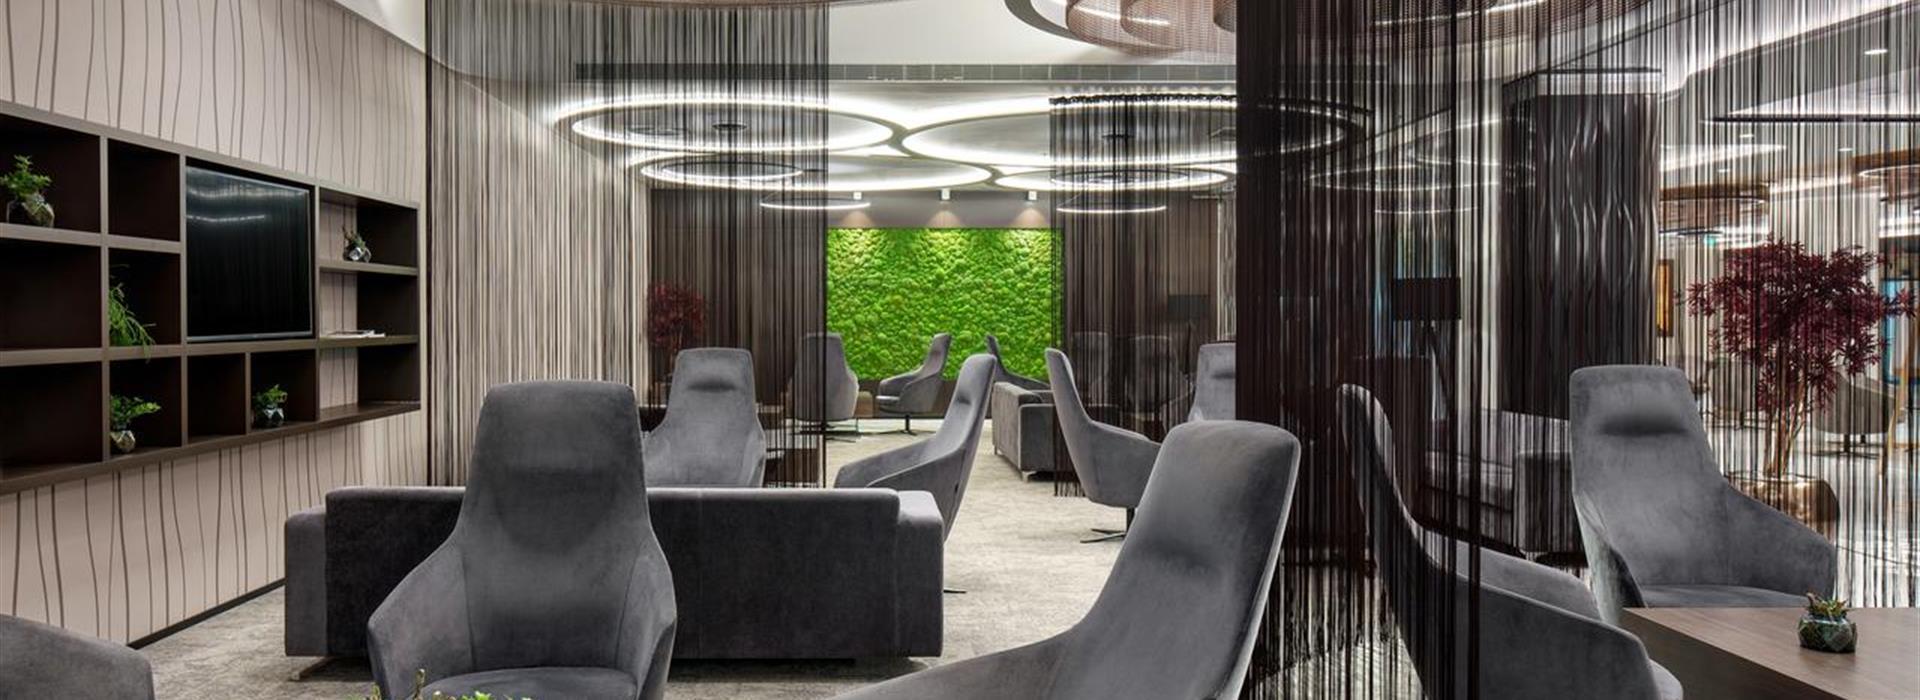 Clarion-Congress-Hotel-Prague